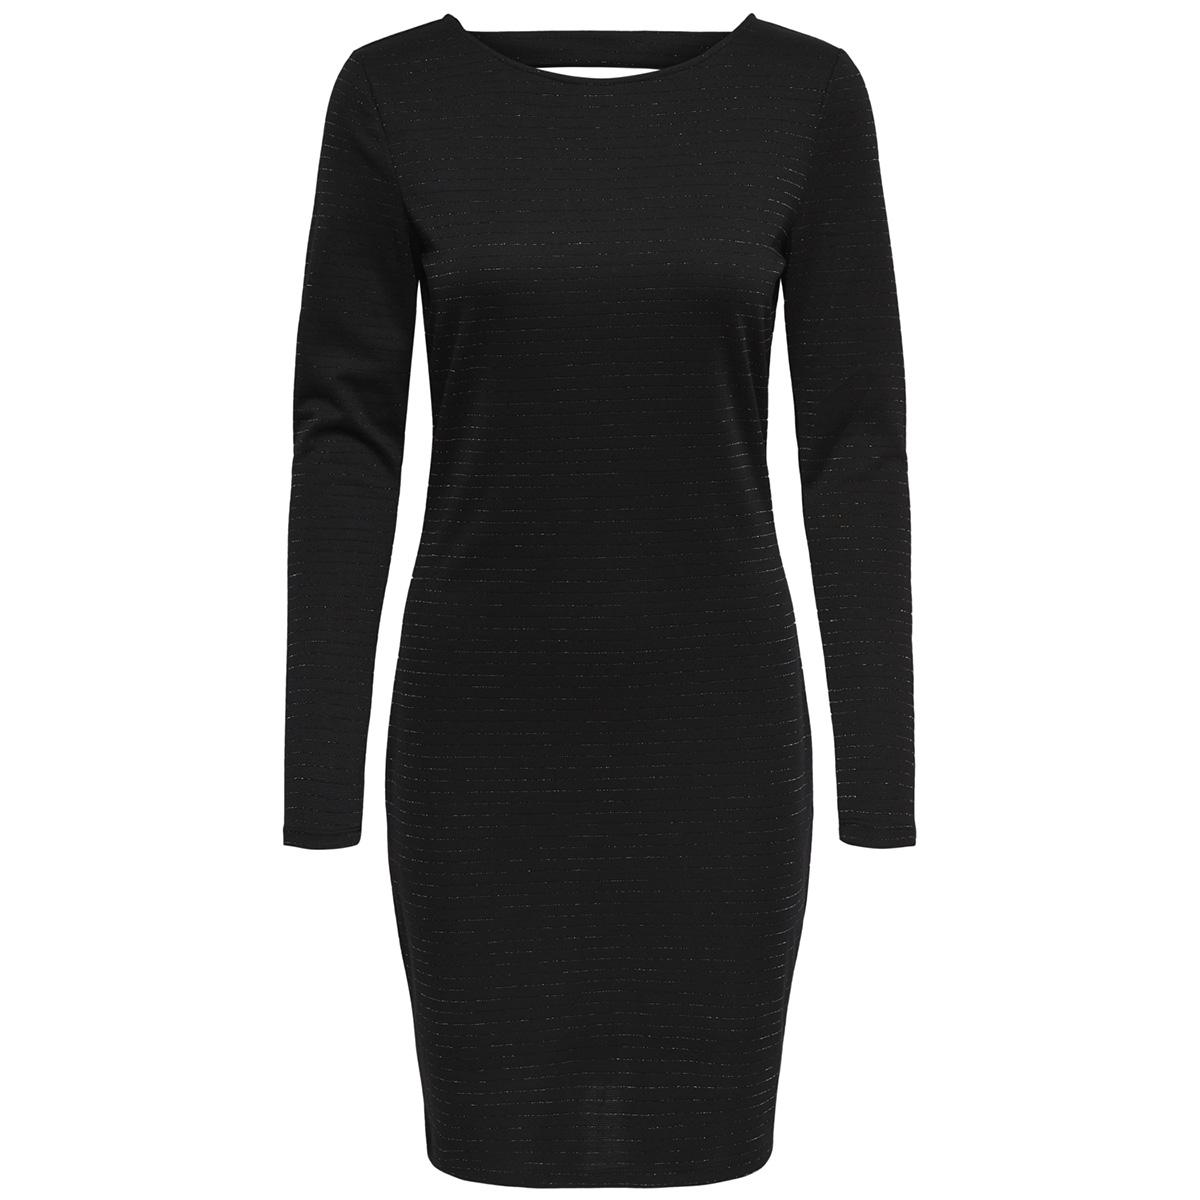 jdyglitter l/s short  dress exp 15170850 jacqueline de yong jurk black/lurex